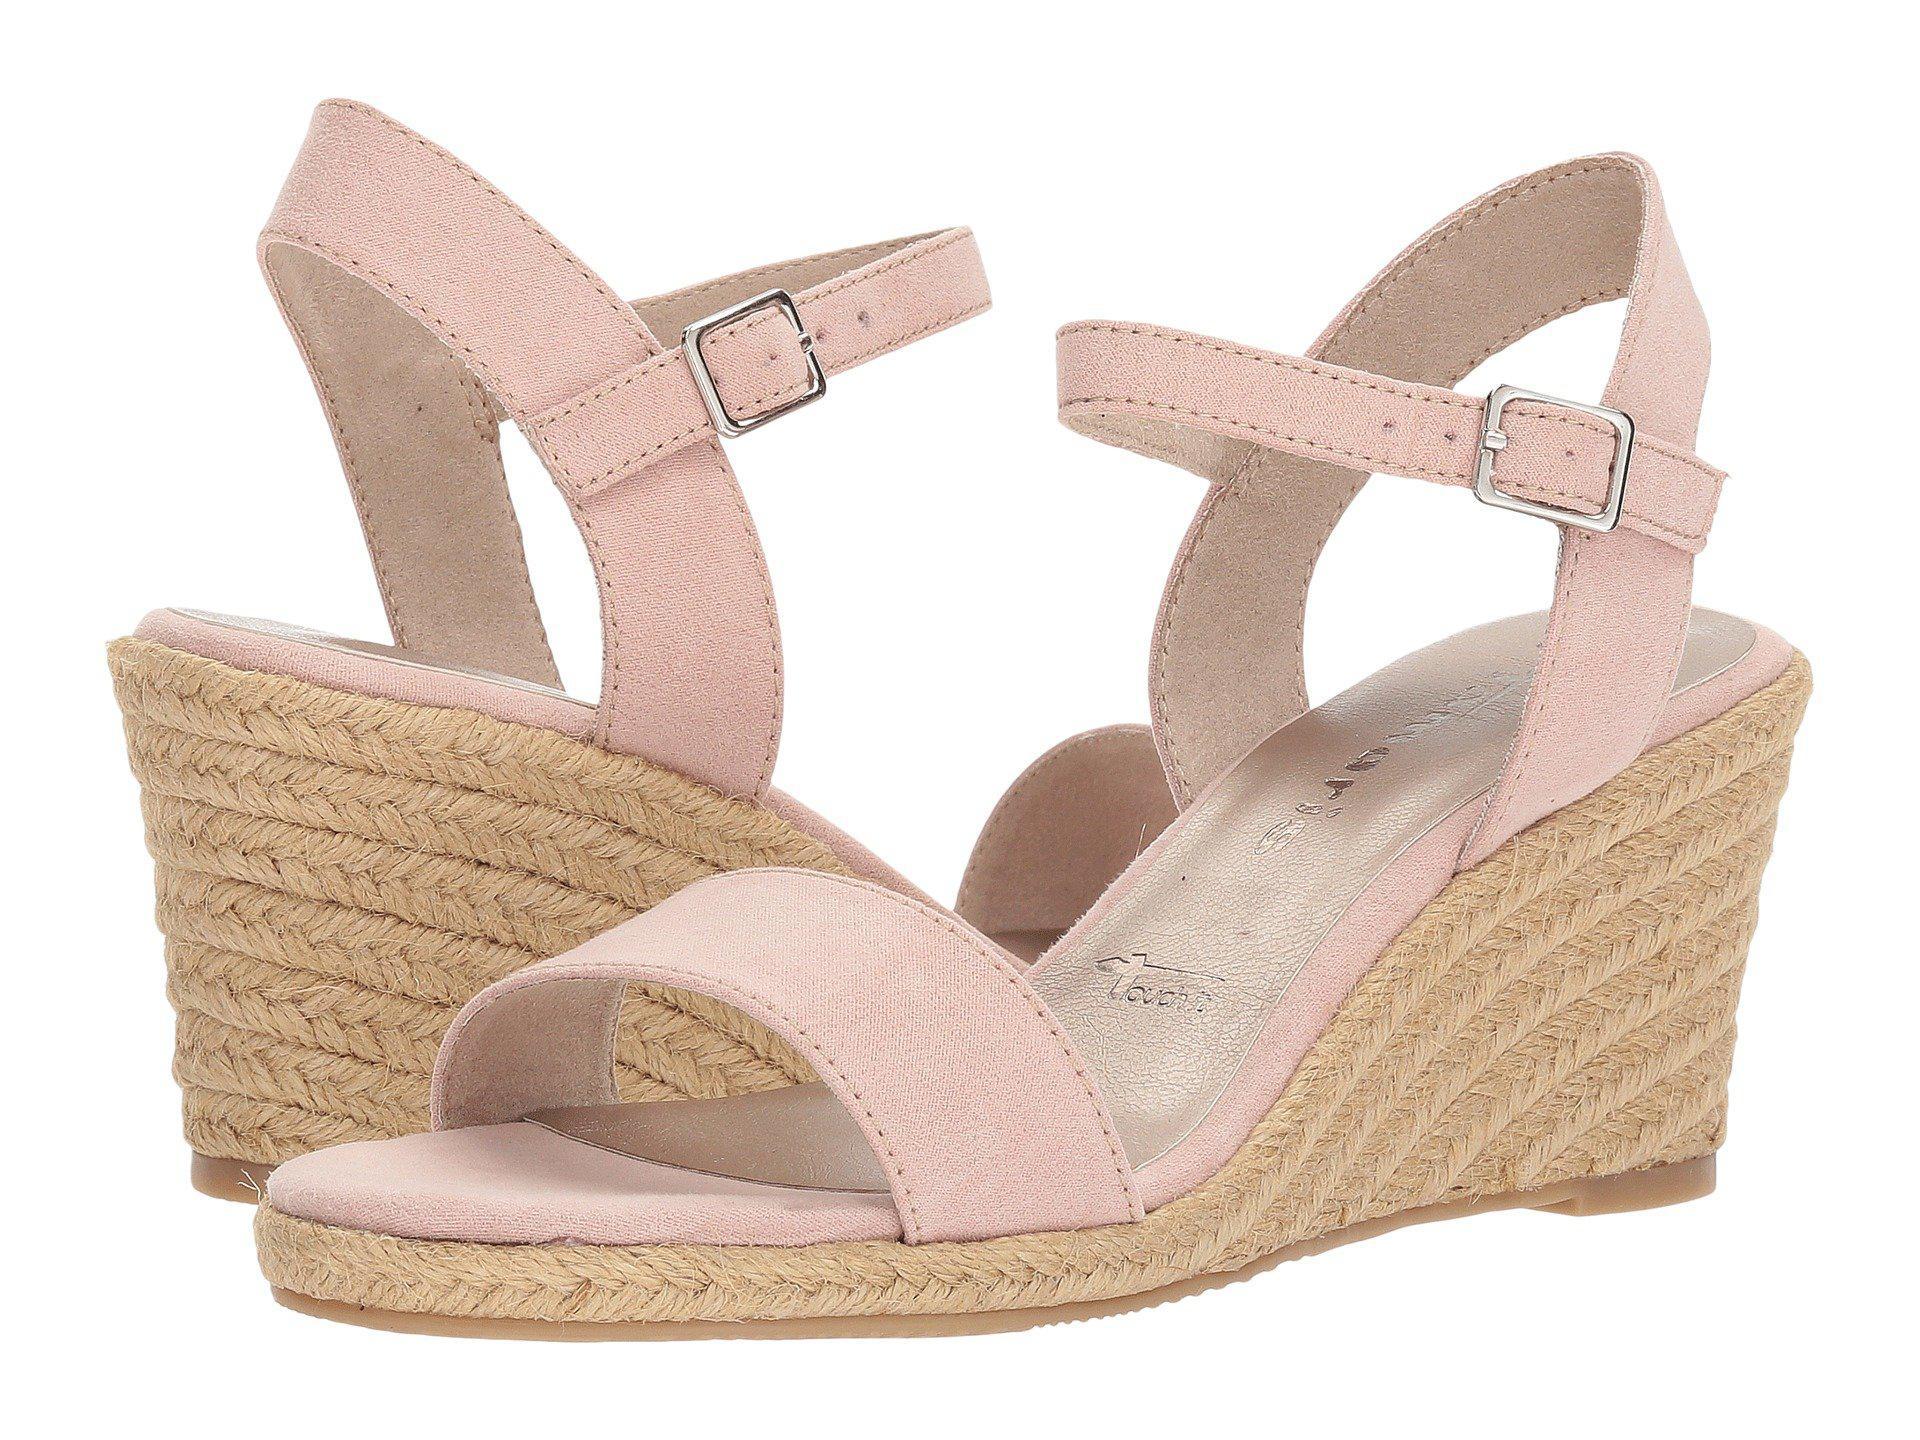 4fb2bac95c2 Lyst - Tamaris Livia 1-1-28300-20 (rose) Women s Sling Back Shoes